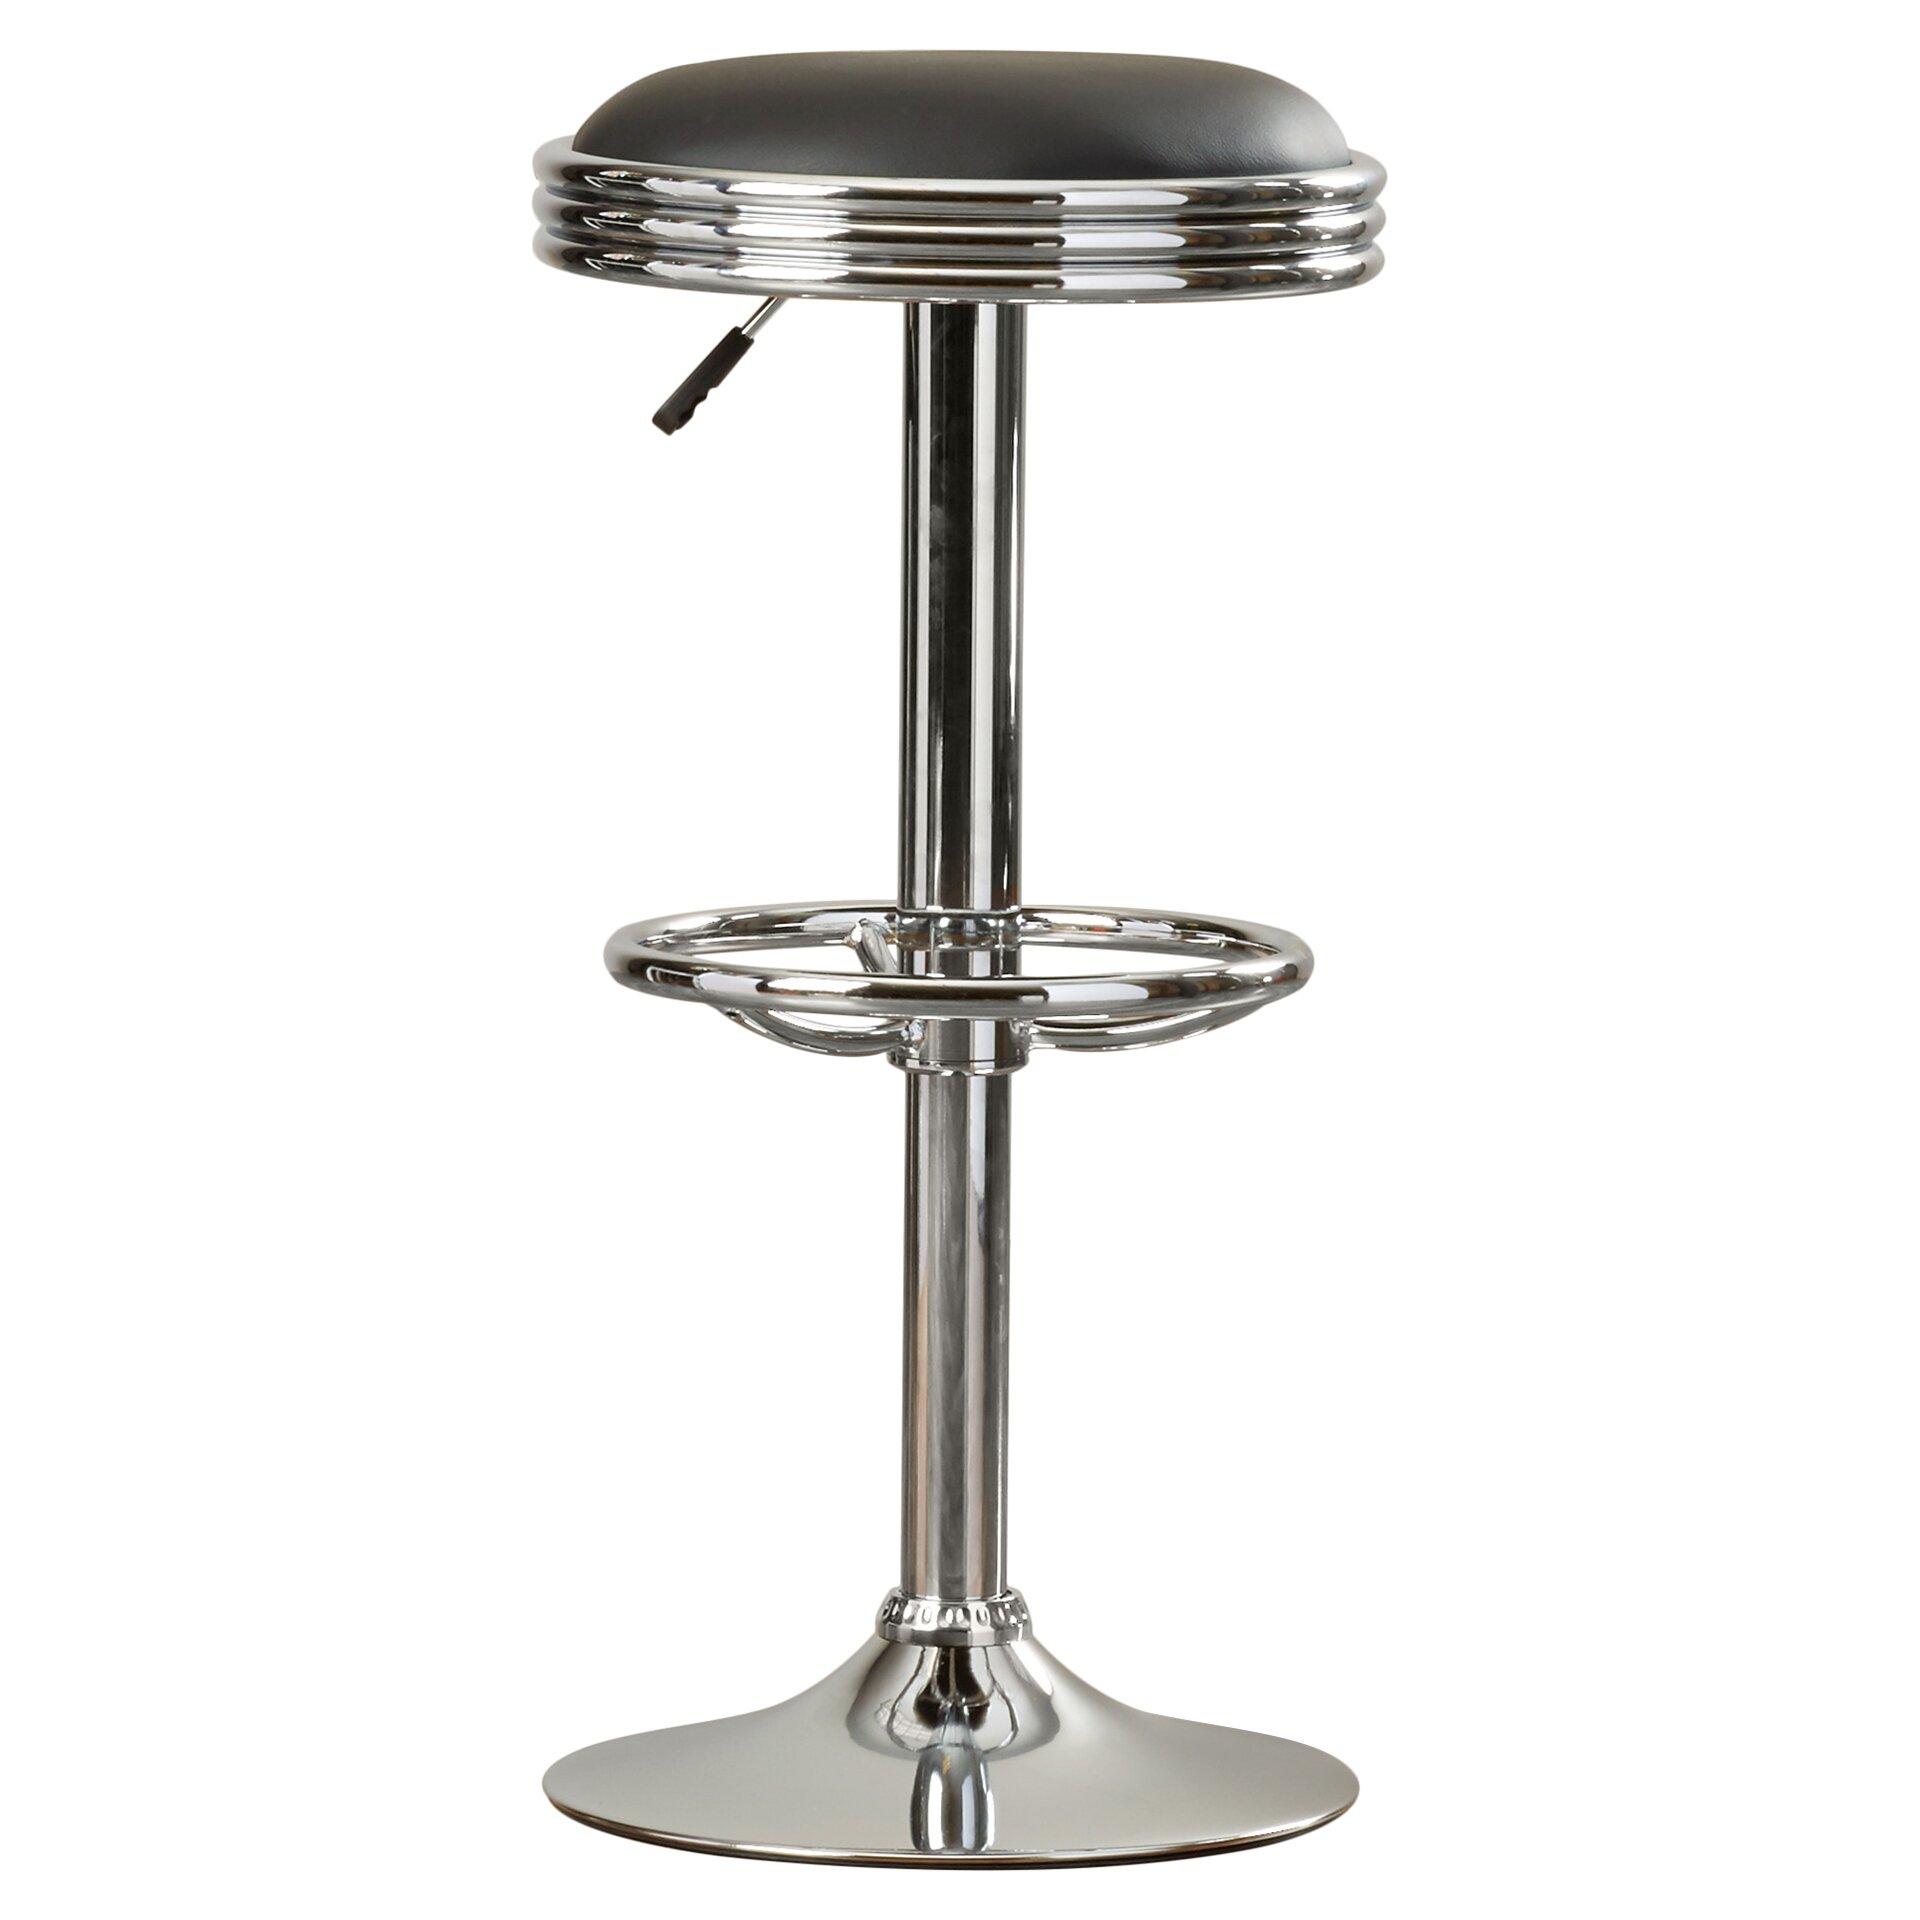 Alcott Hill Findlay Adjustable Height Swivel Bar Stool